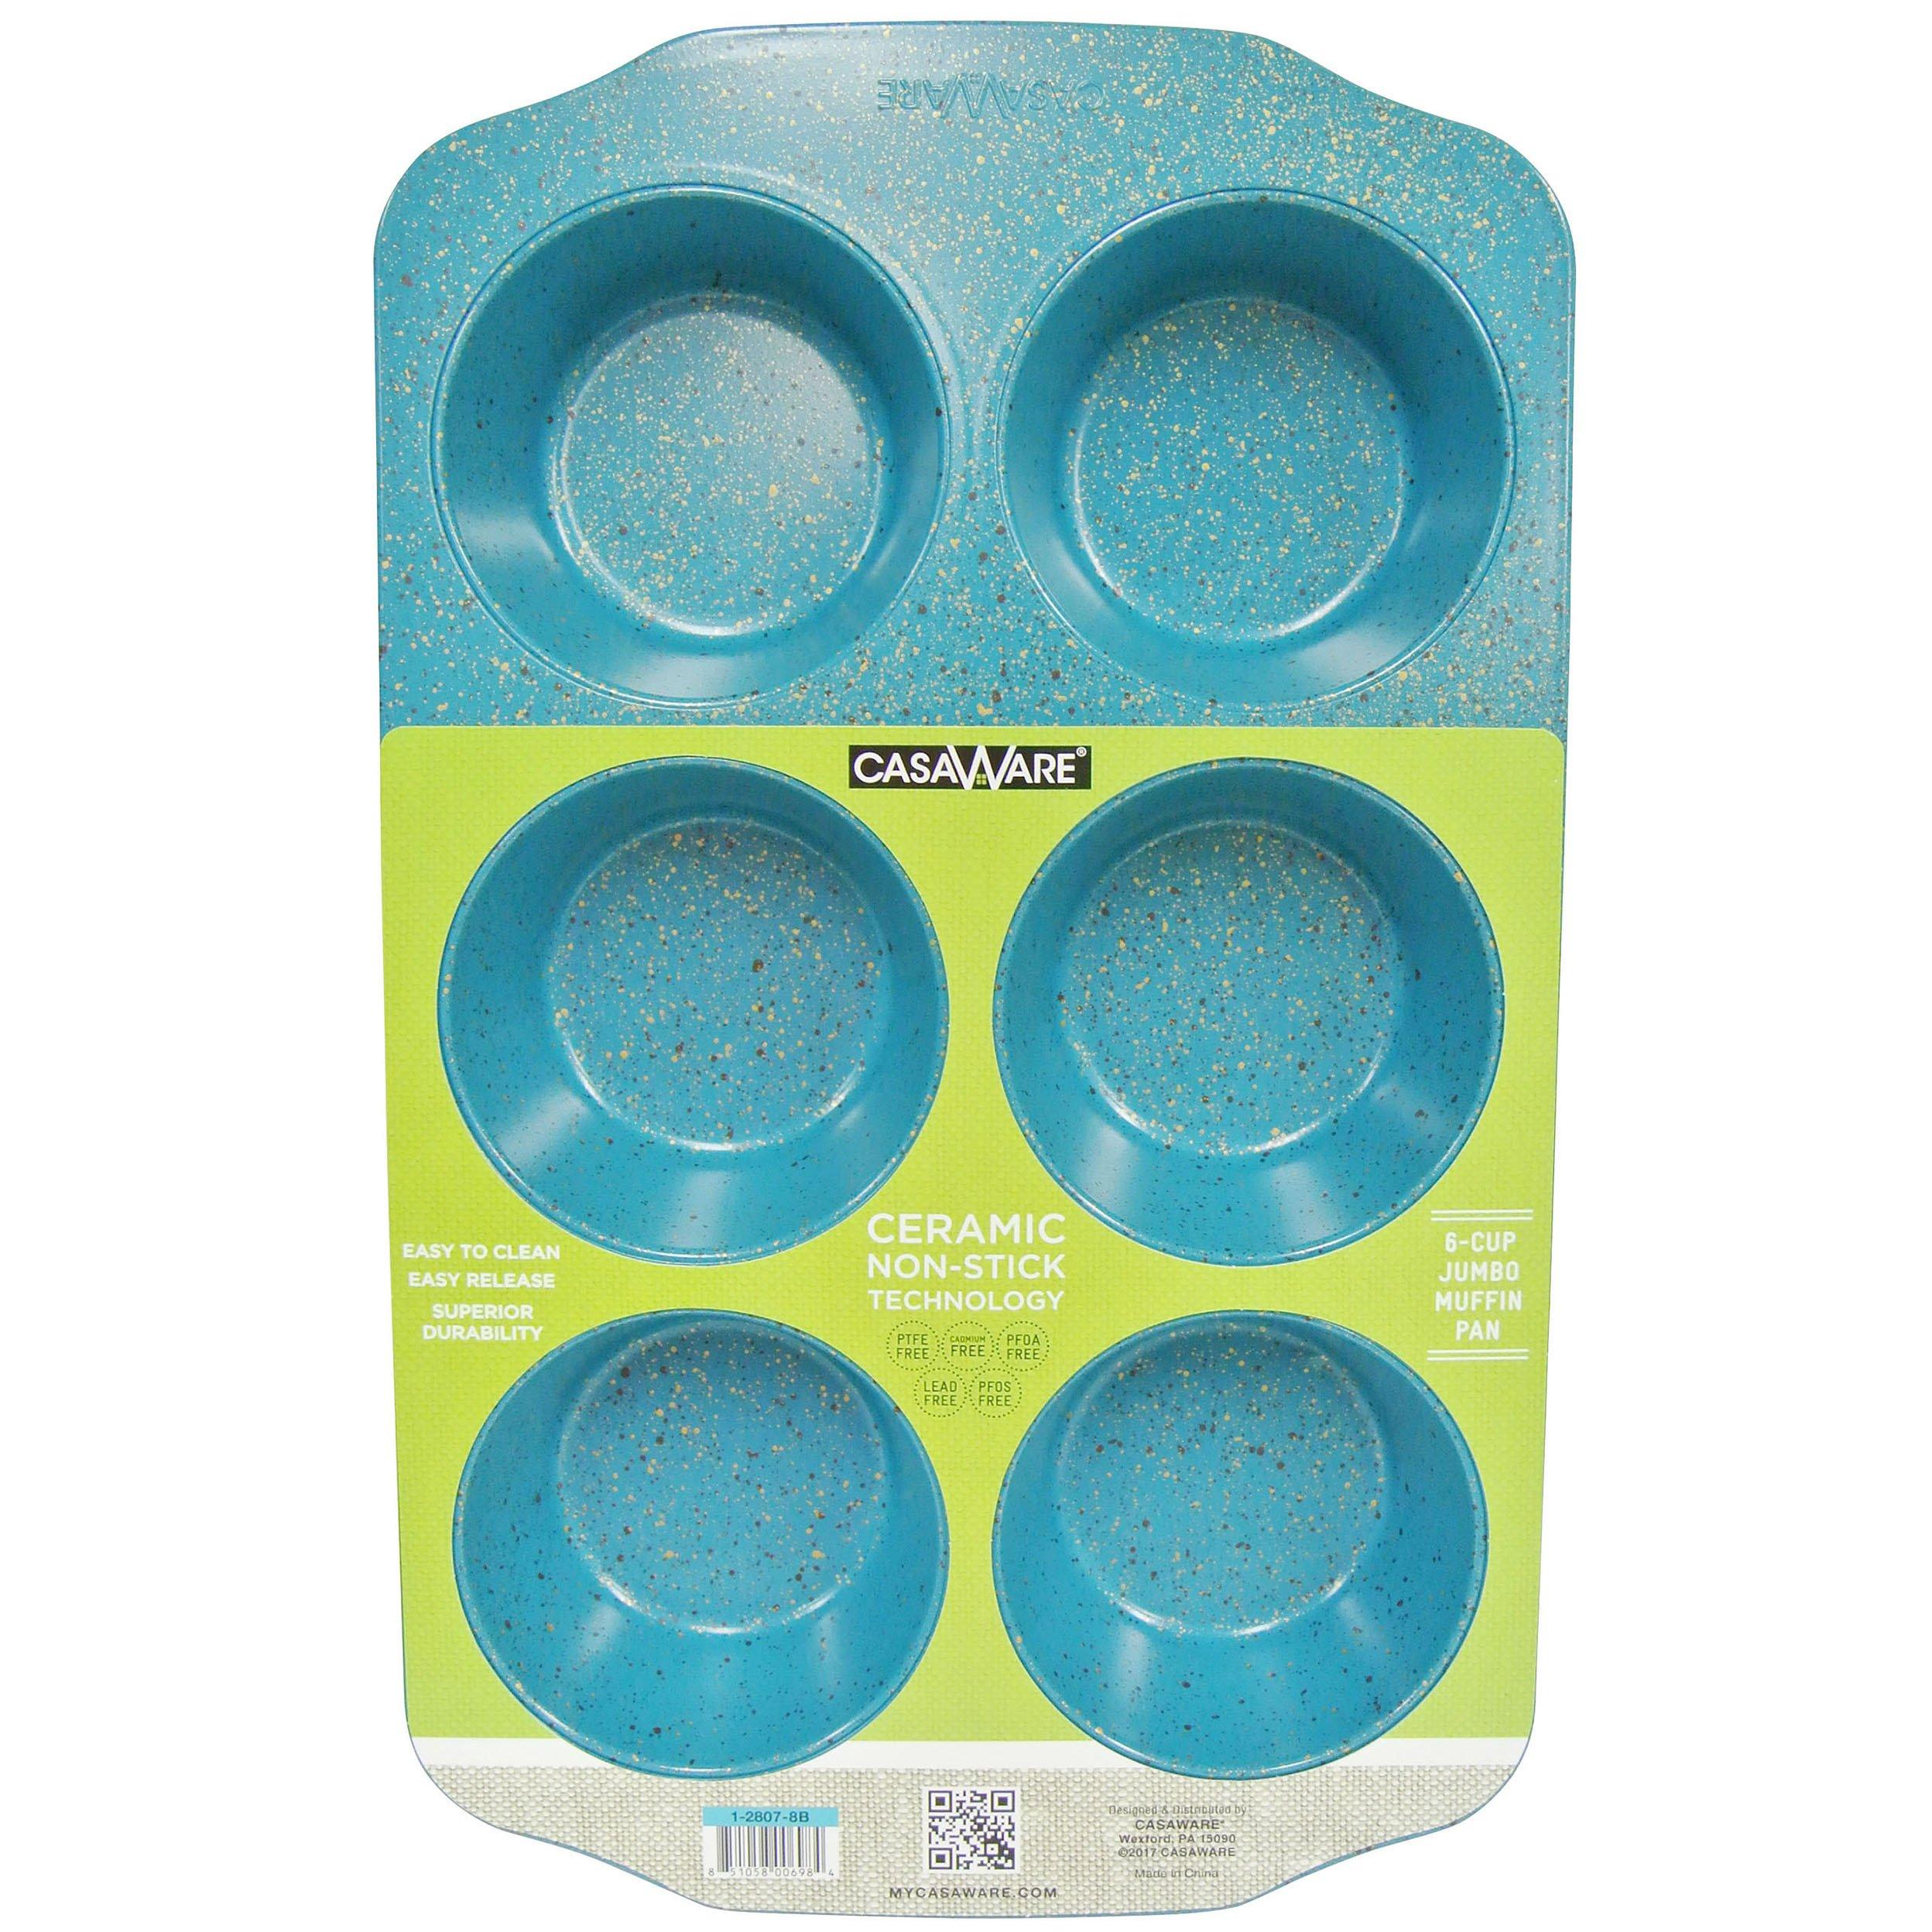 CasaWare Jumbo Muffin Pan 6 Cup Ceramic Coated Non-Stick (Blue Granite)